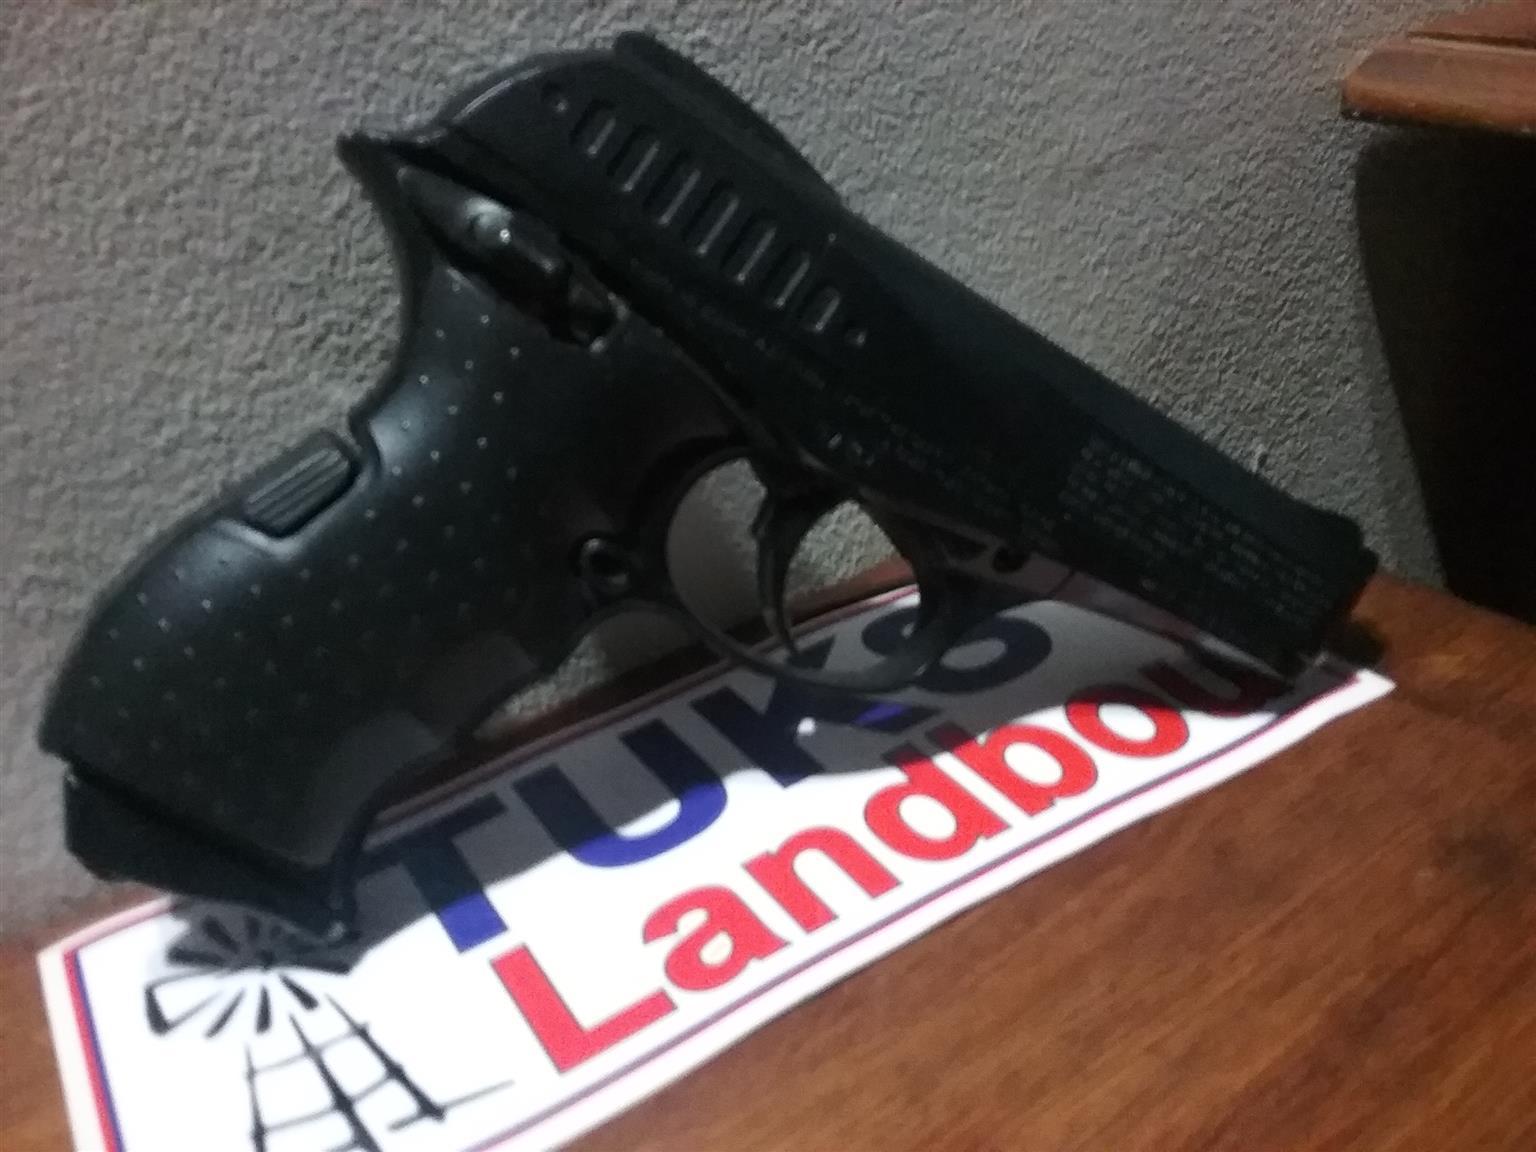 Co2 Daisy air pistol